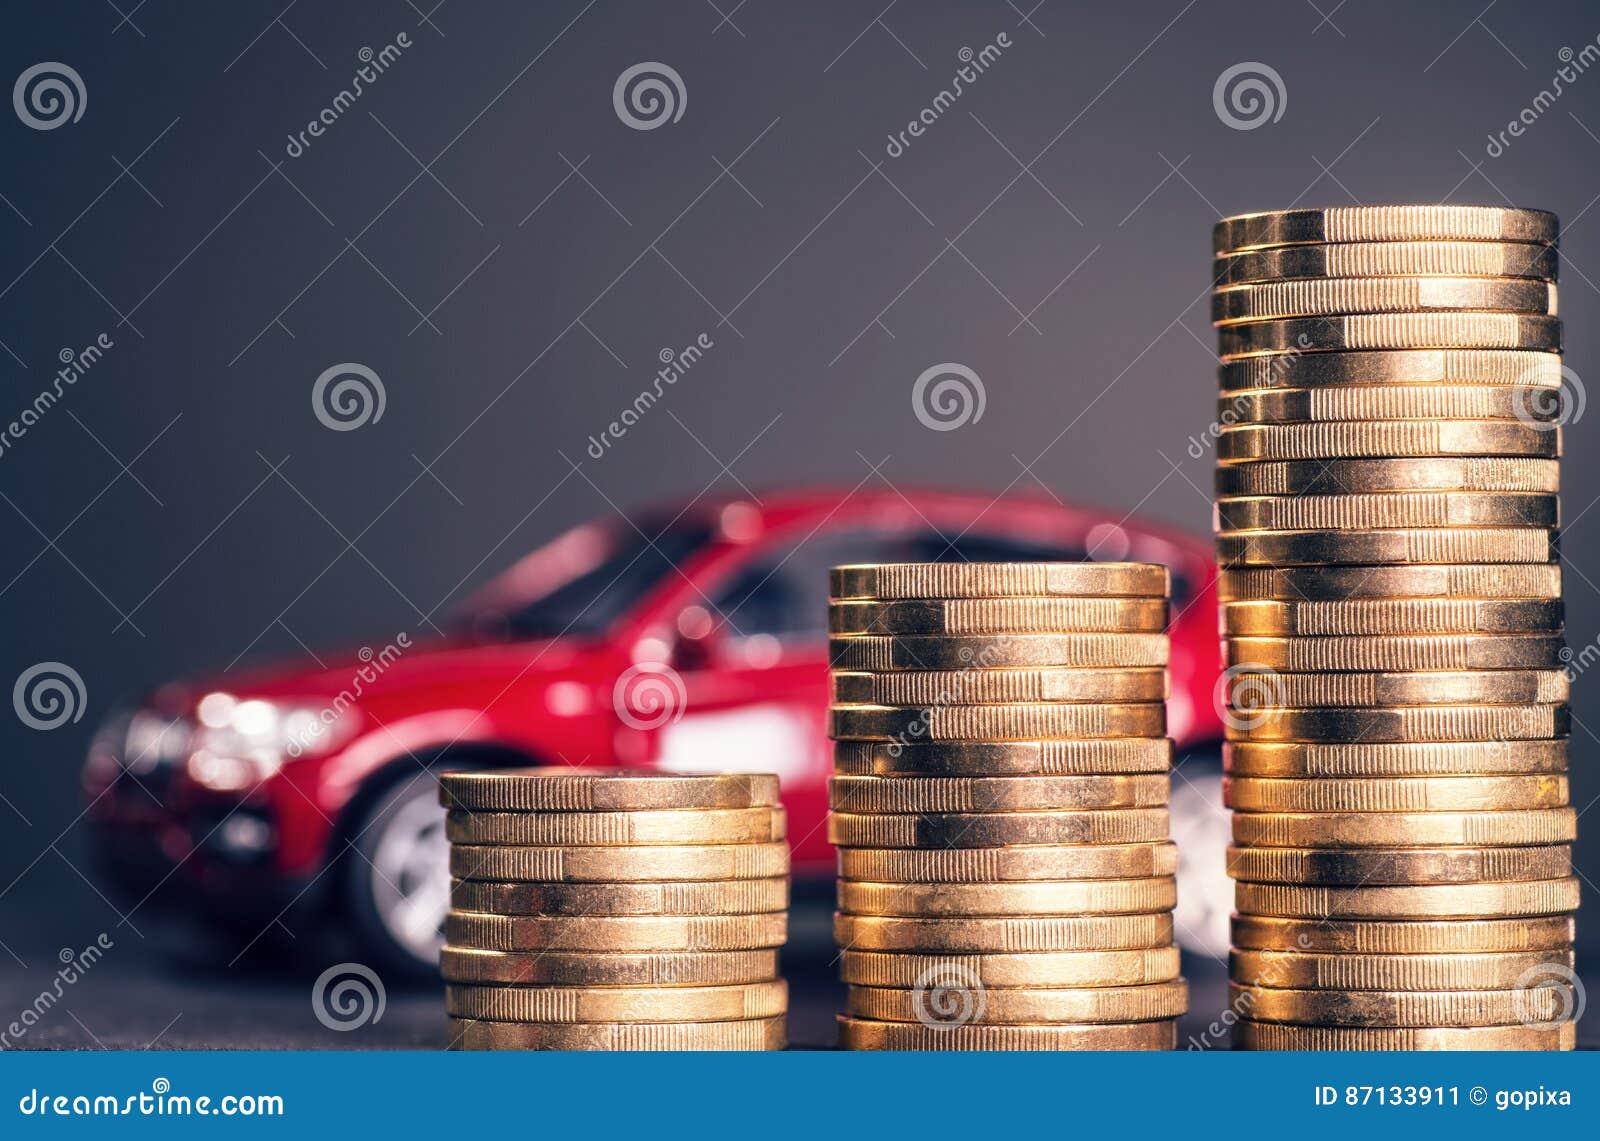 High car costs